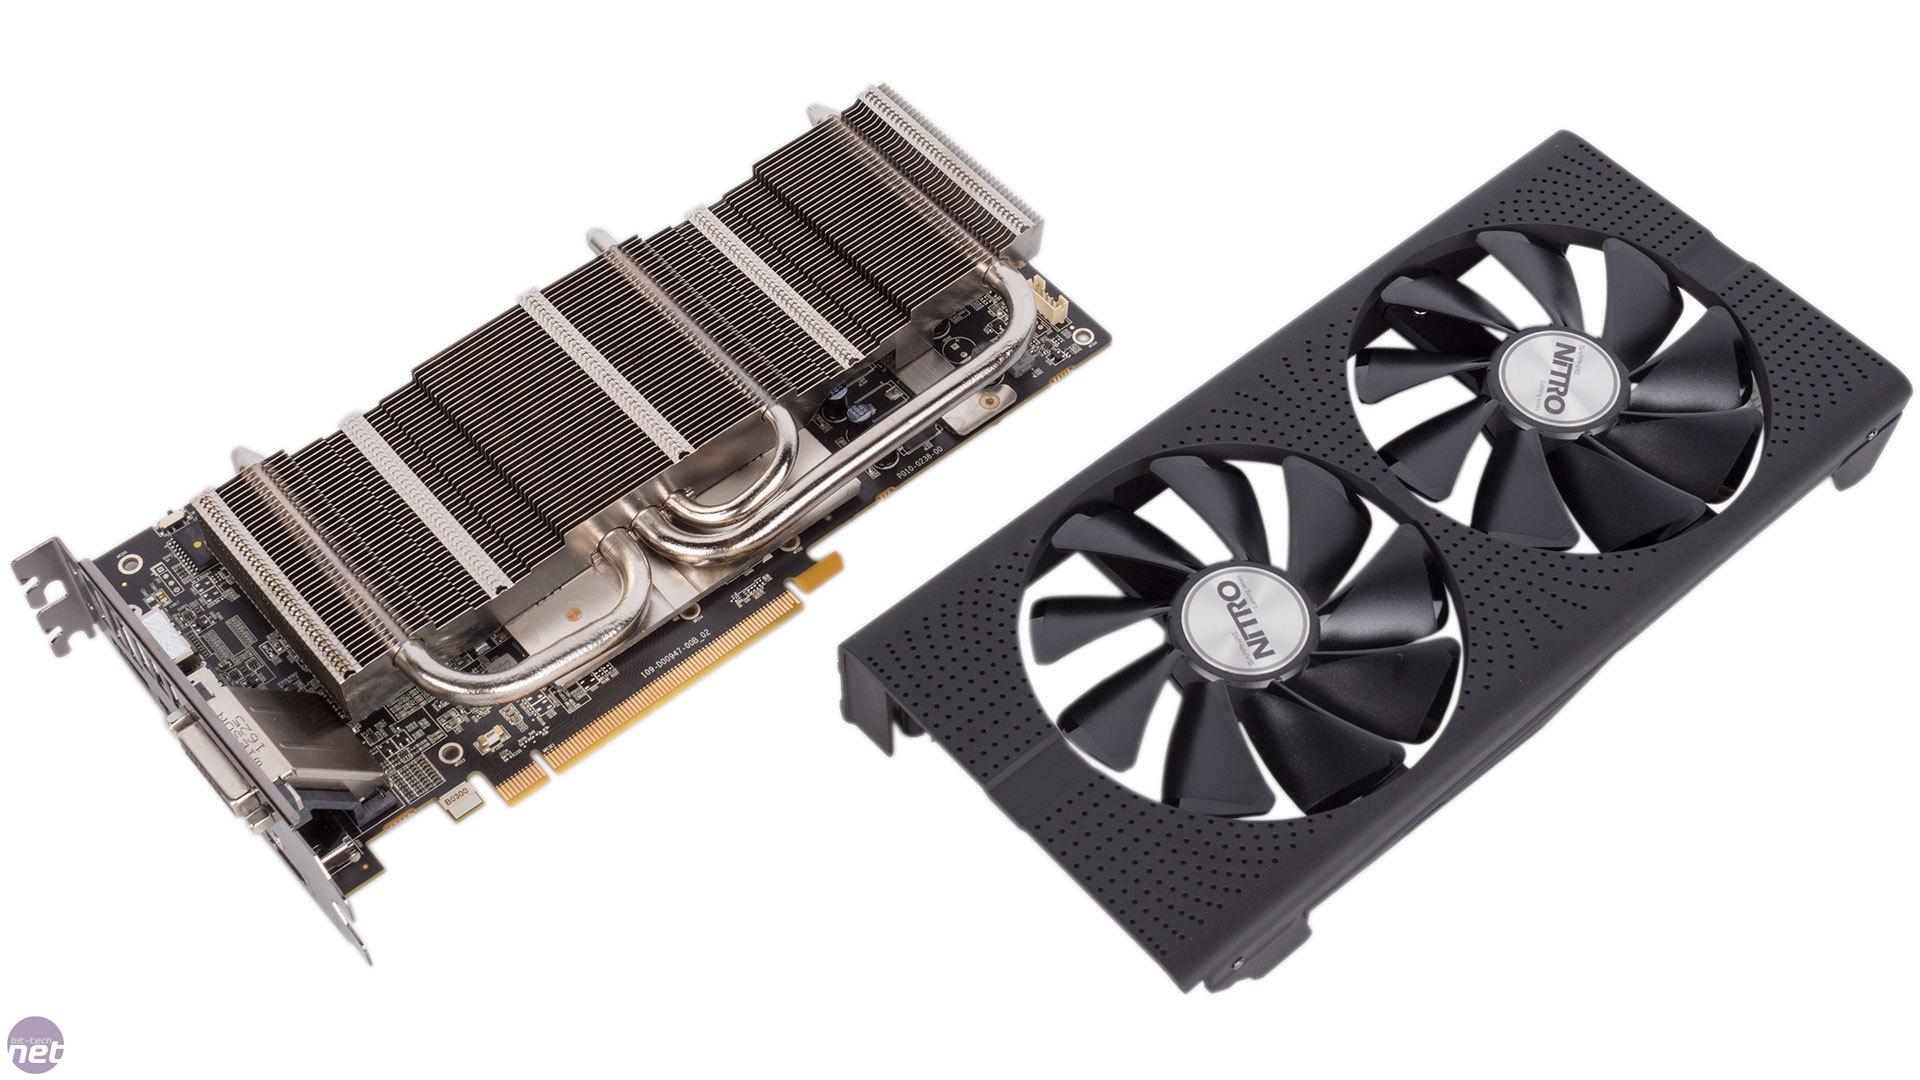 Sapphire Radeon Rx 470 Nitro Oc 4gb Review Bit Tech Net